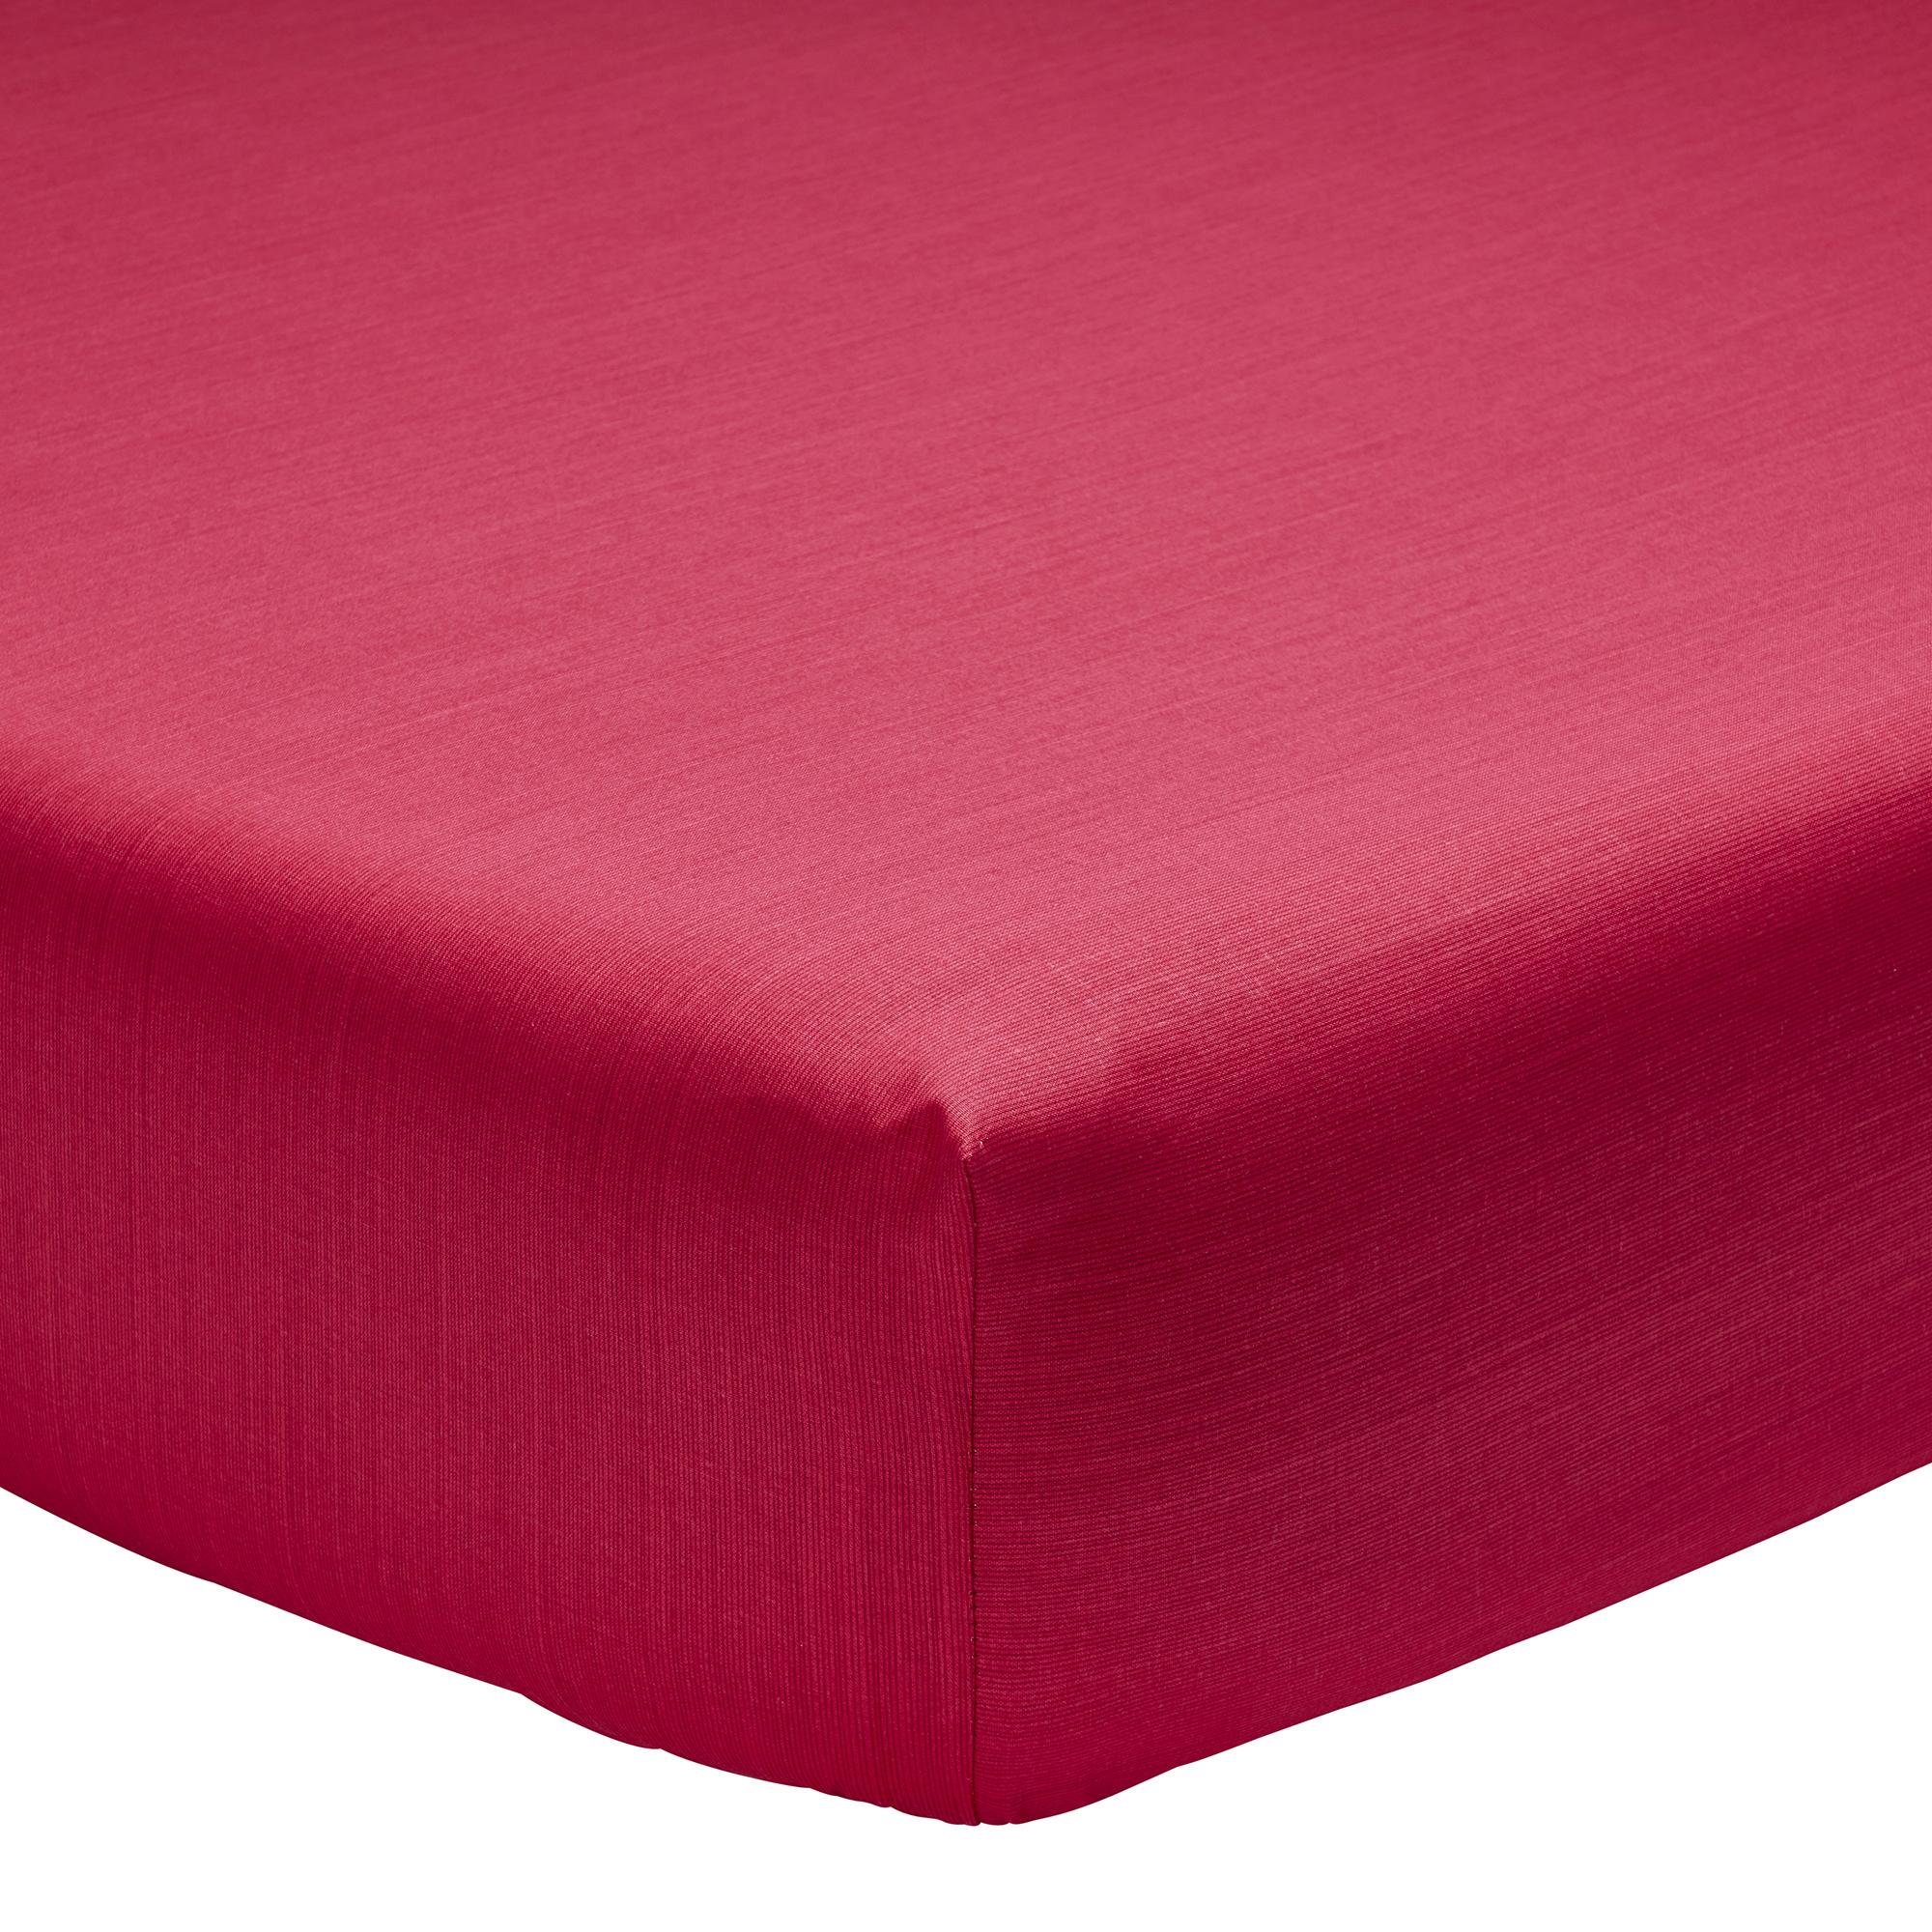 Drap housse fines rayures en bambou rouge 160 x 200